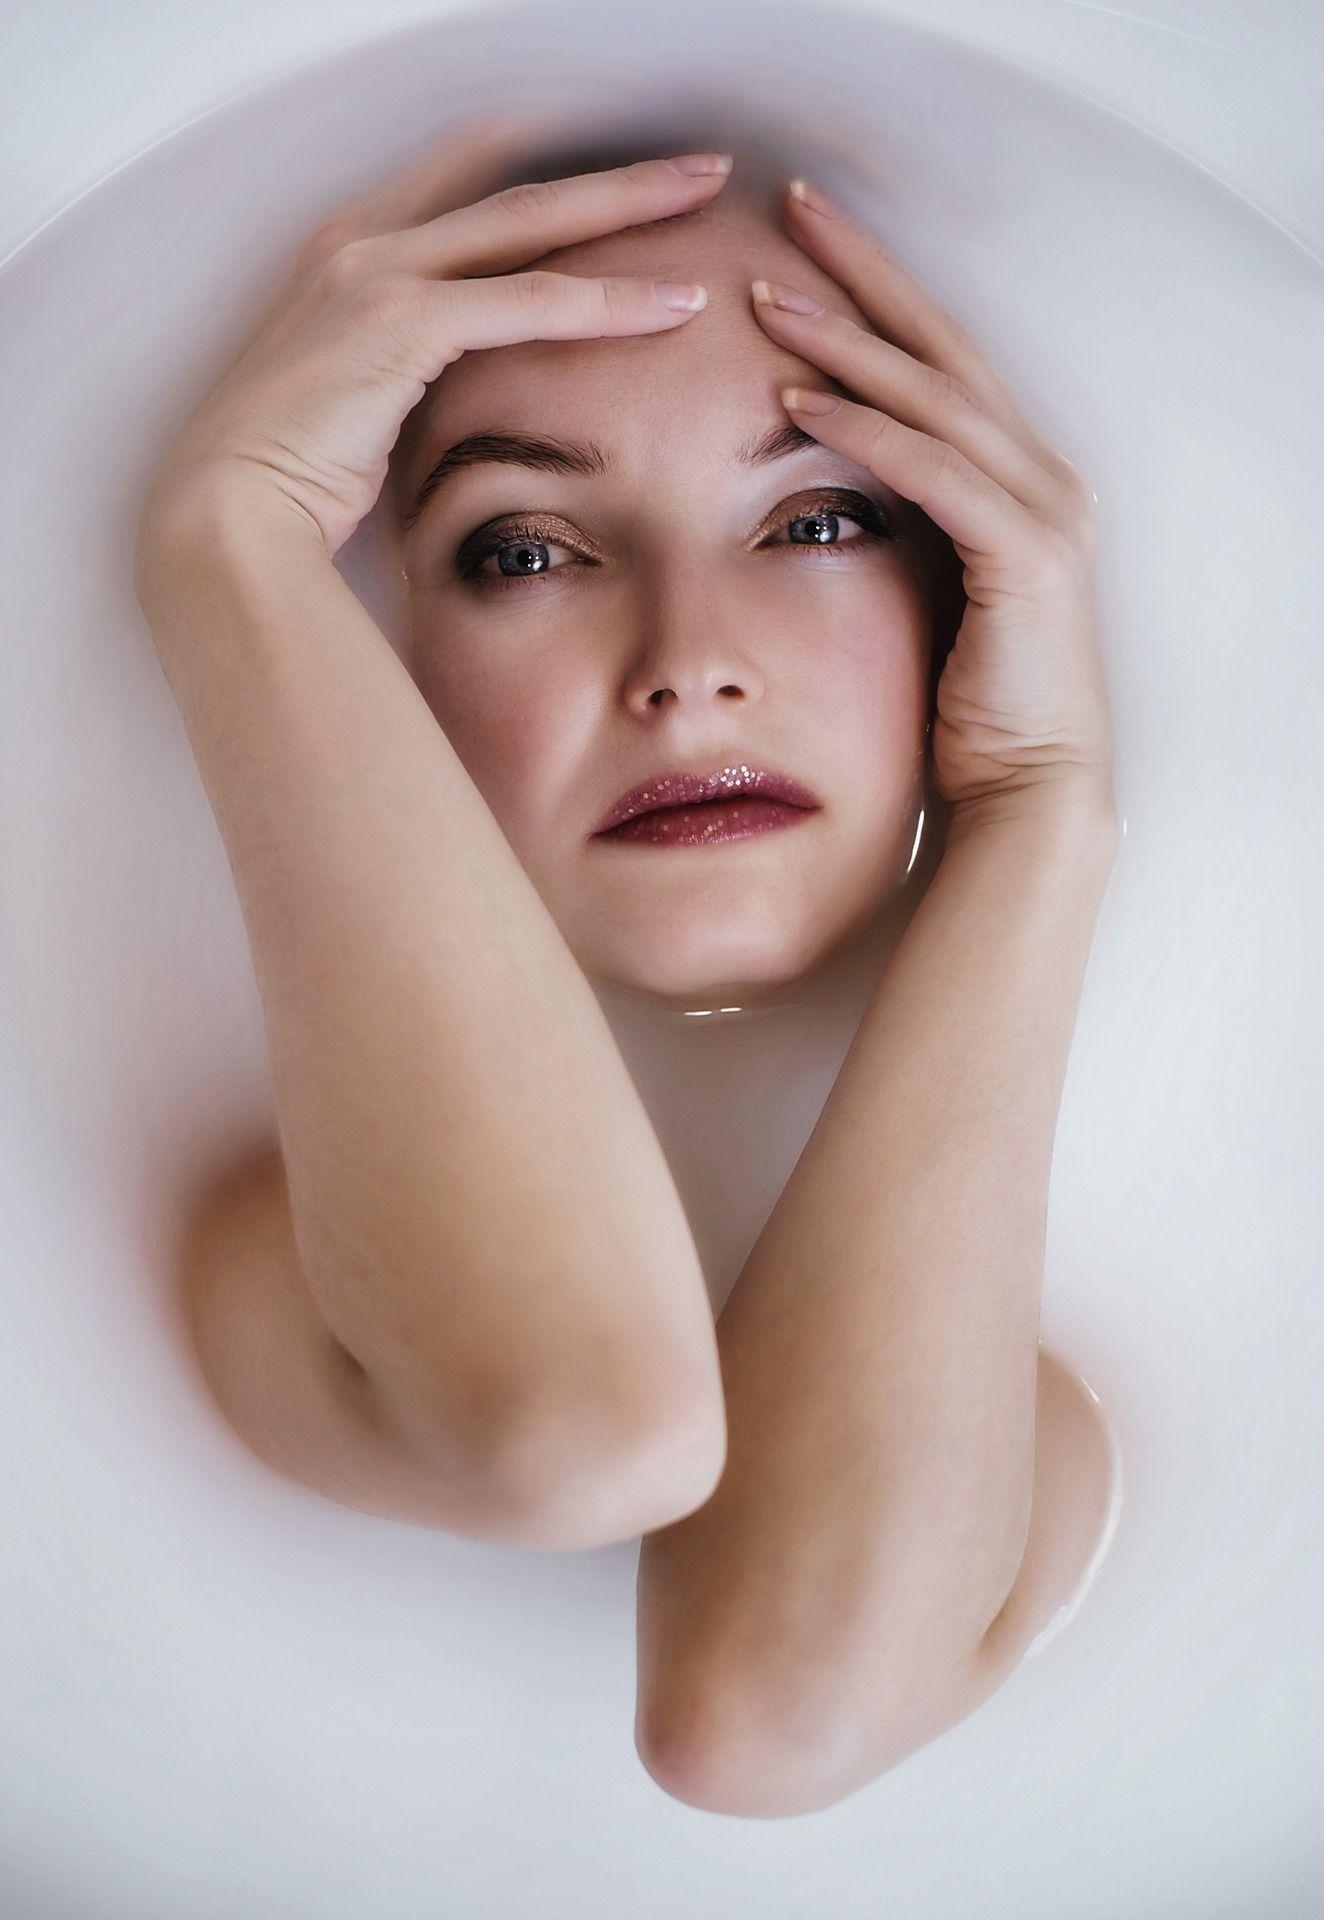 060ea5959 Portrait Of A Woman Taking A Milk Bath - by lightstargod #people  #photography #freeimage